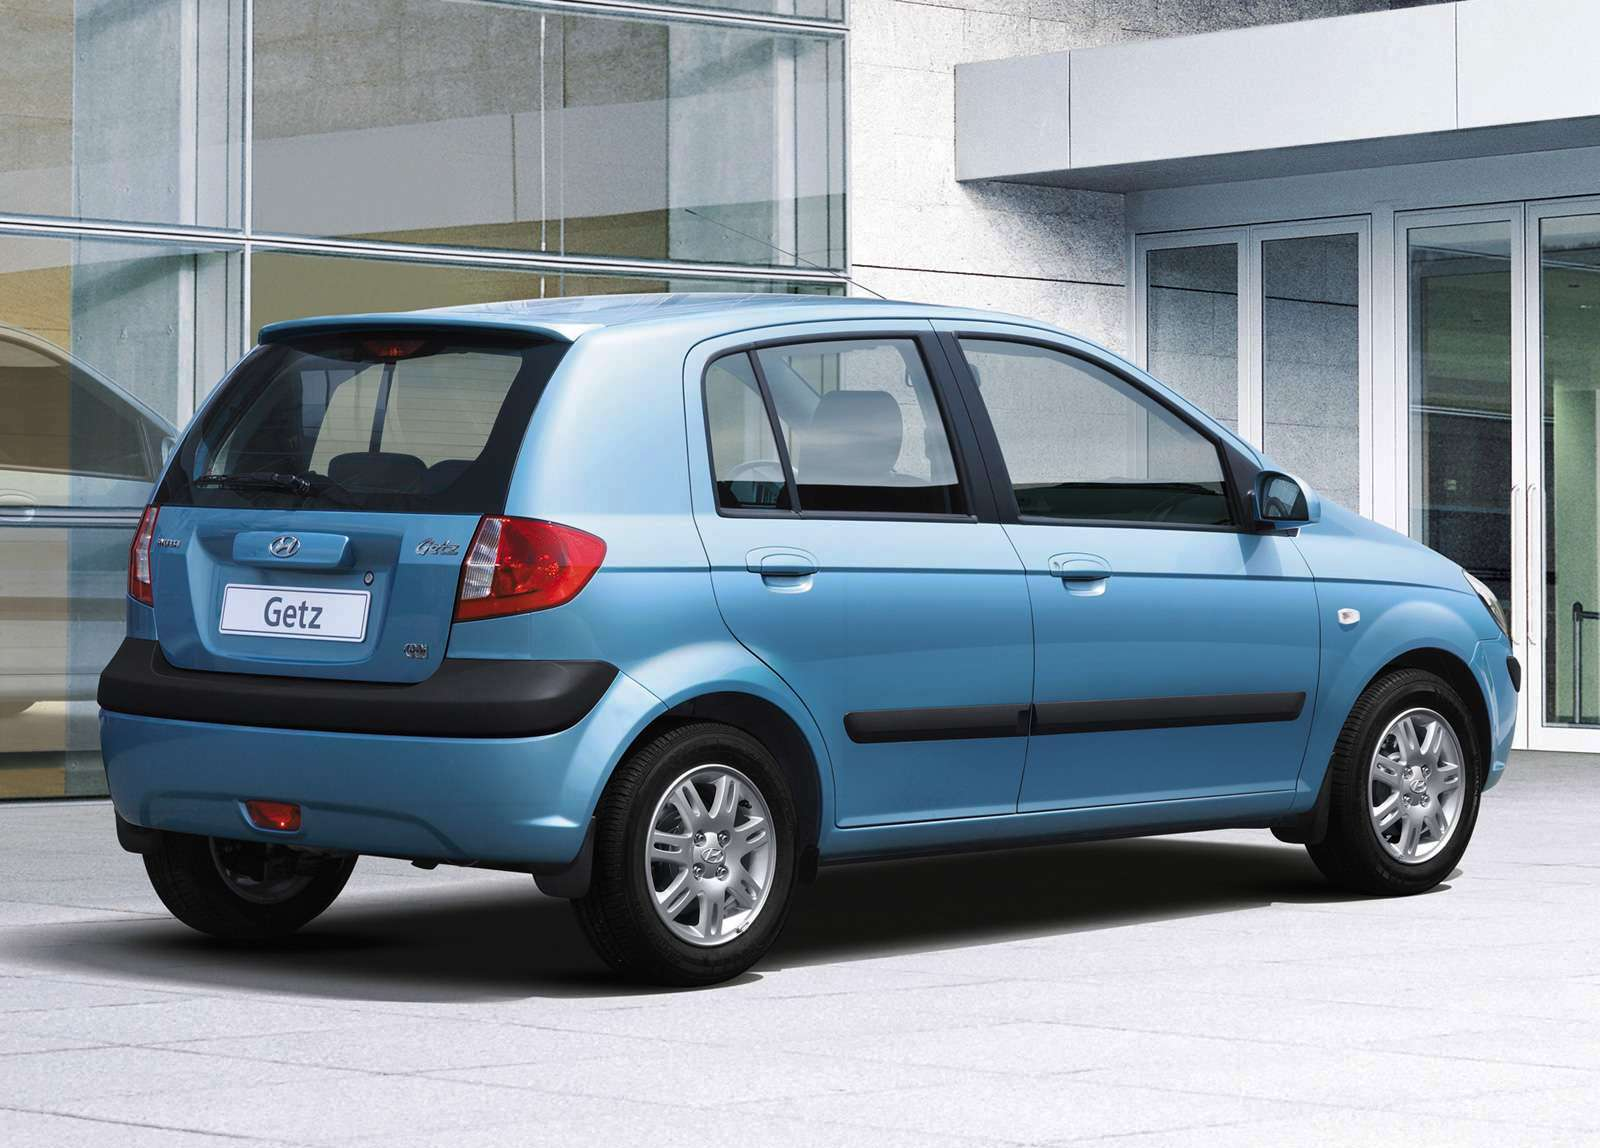 Hyundai-Getz-CRDi-Rear-View.jpg